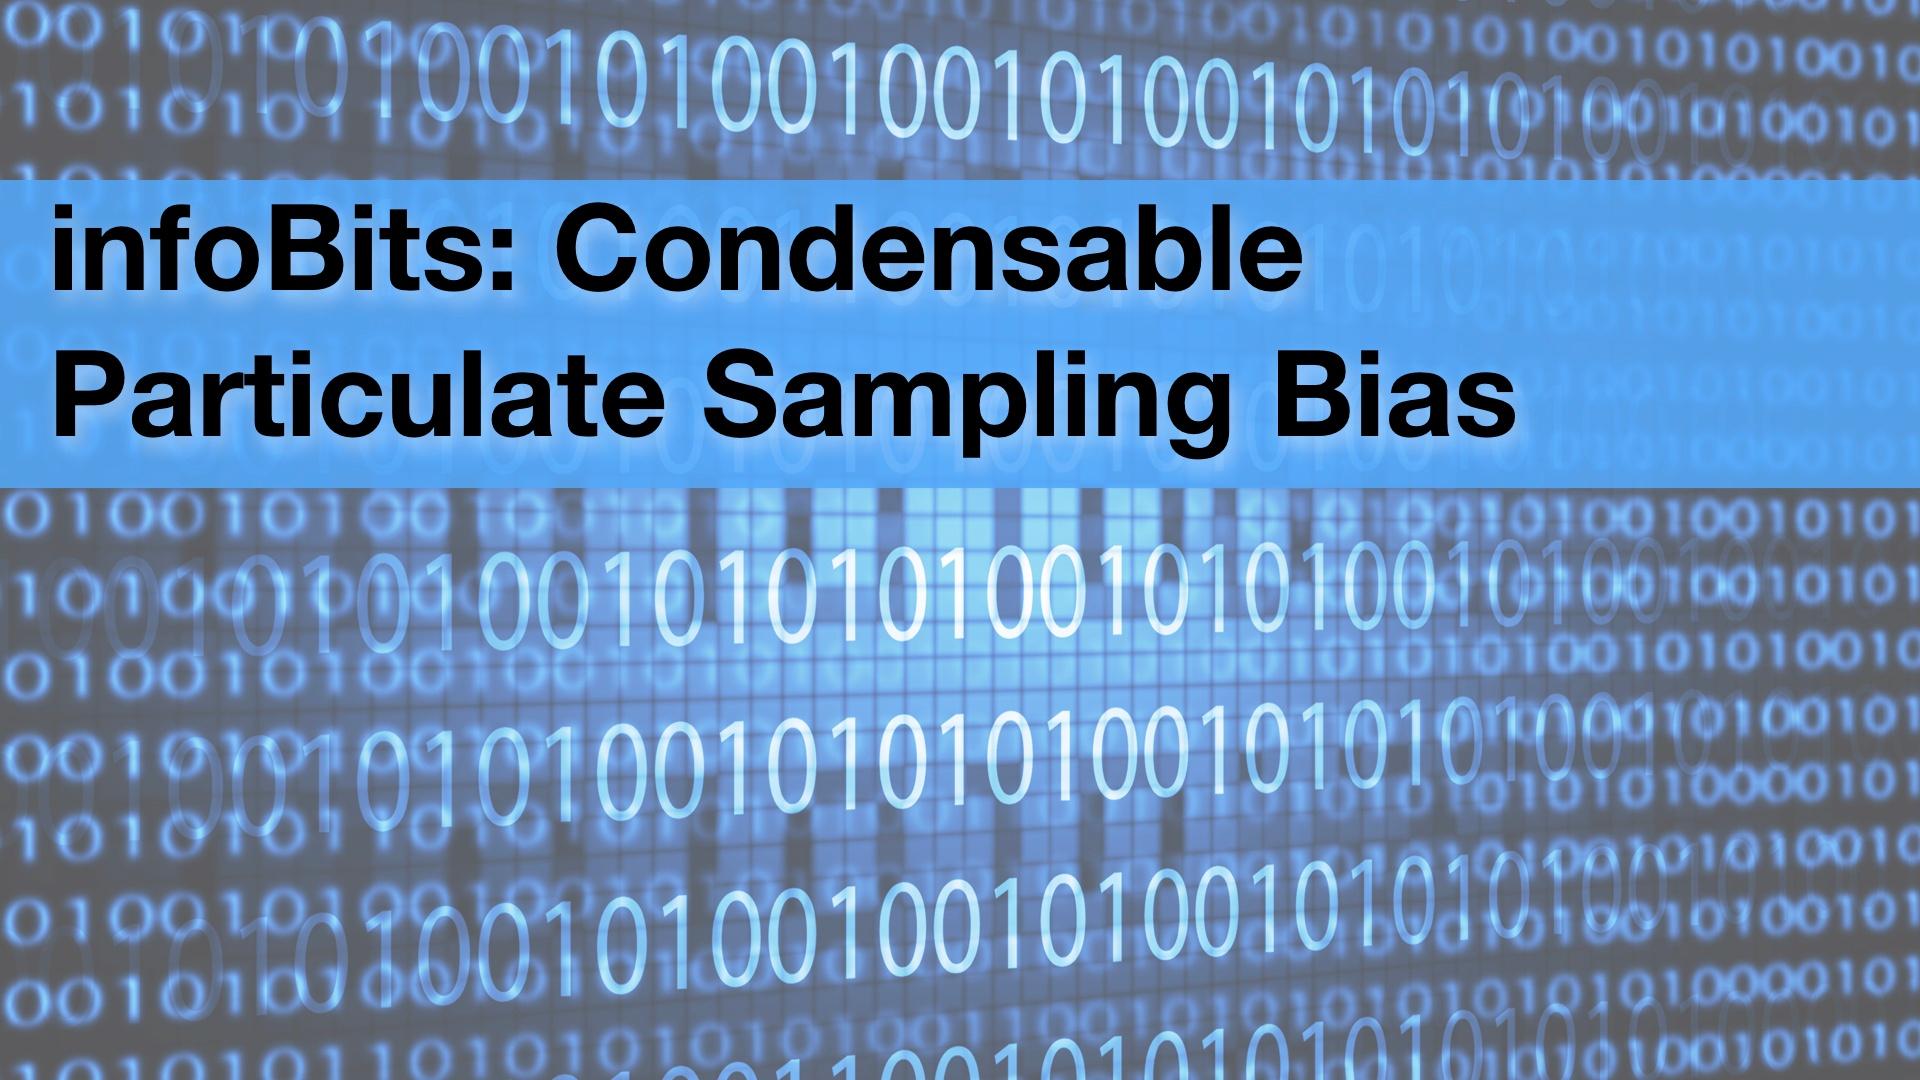 infoBits: Condensable Particulate Sampling Bias